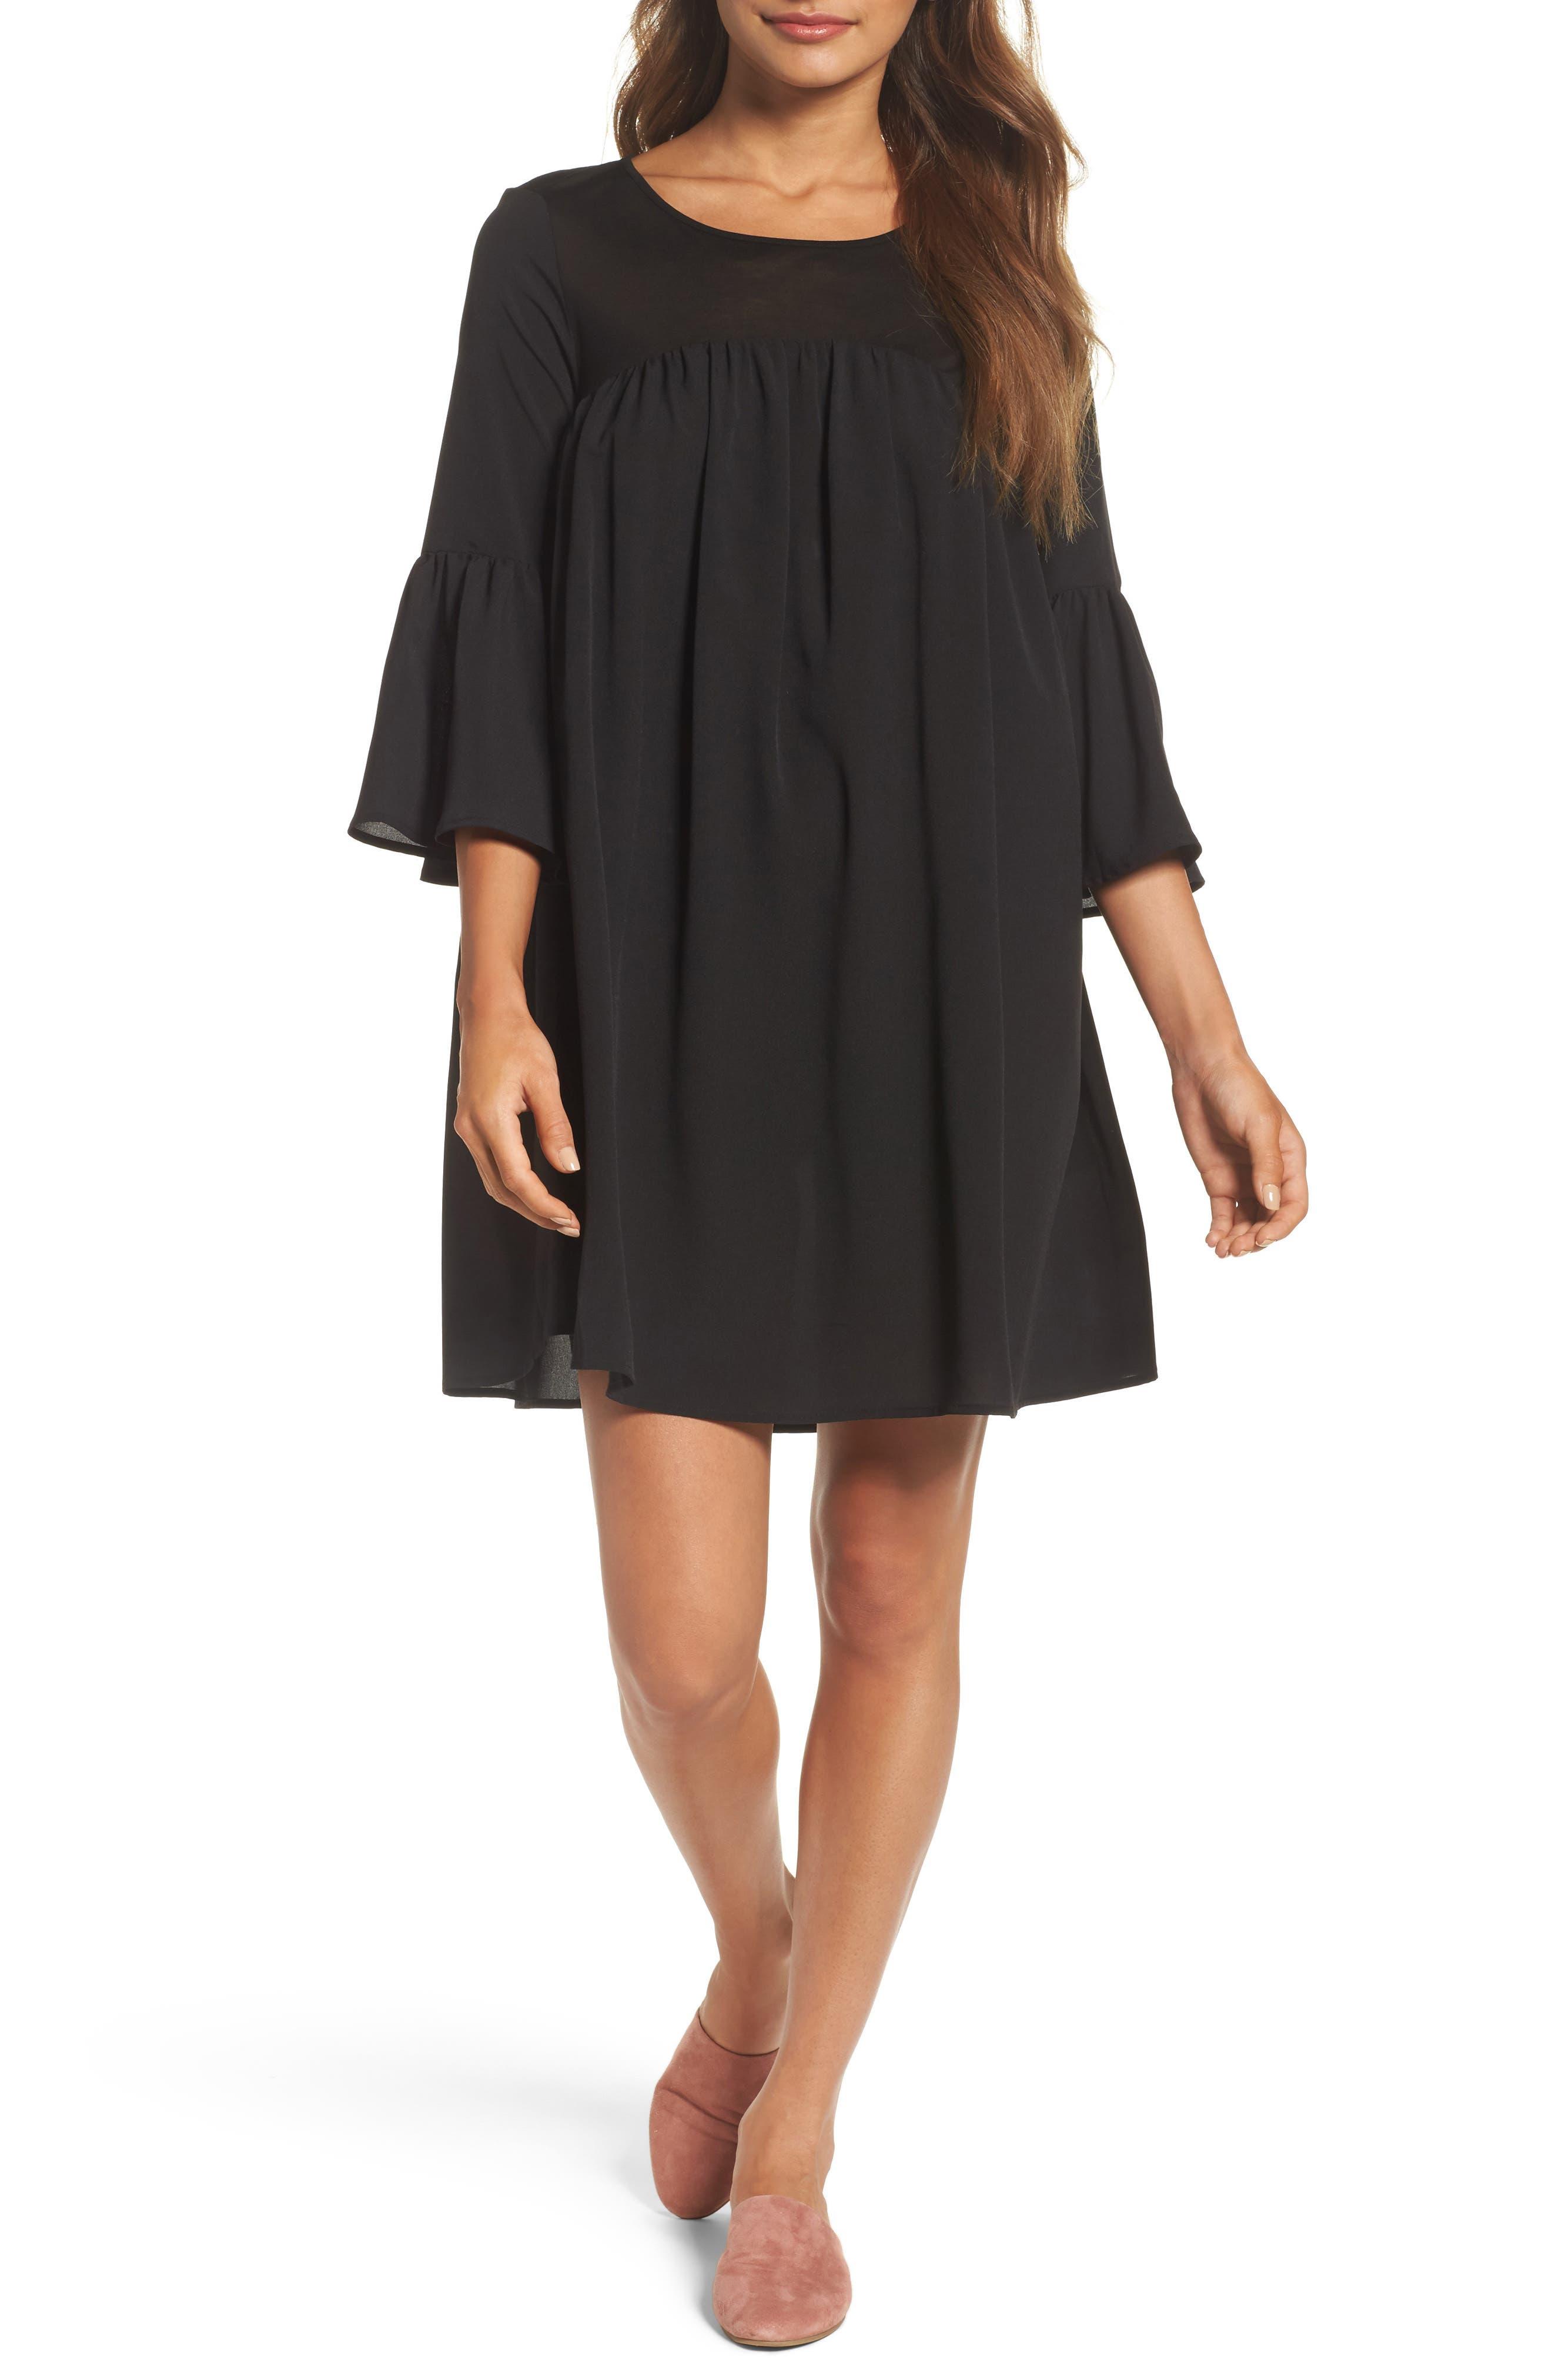 Polly Plains Shift Dress,                             Main thumbnail 1, color,                             Black